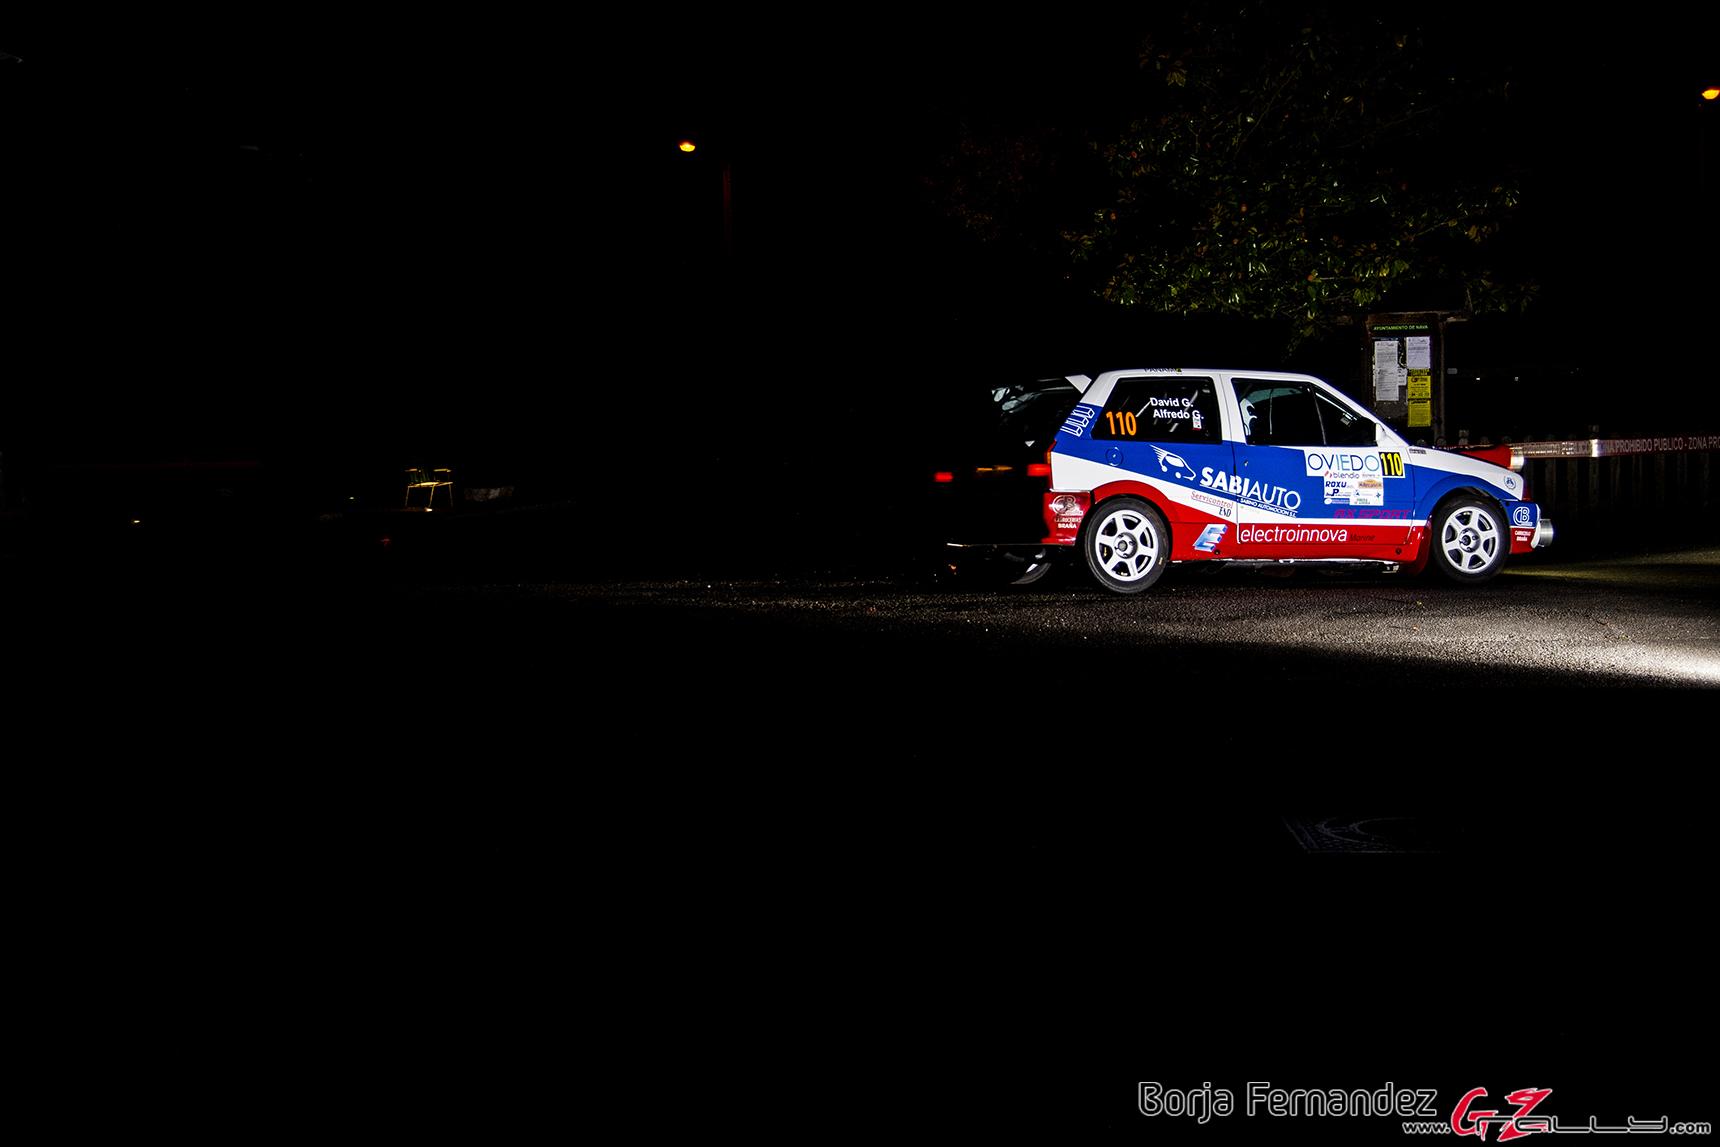 Rally Princesa de Asturias 2020 - Borja Fernandez